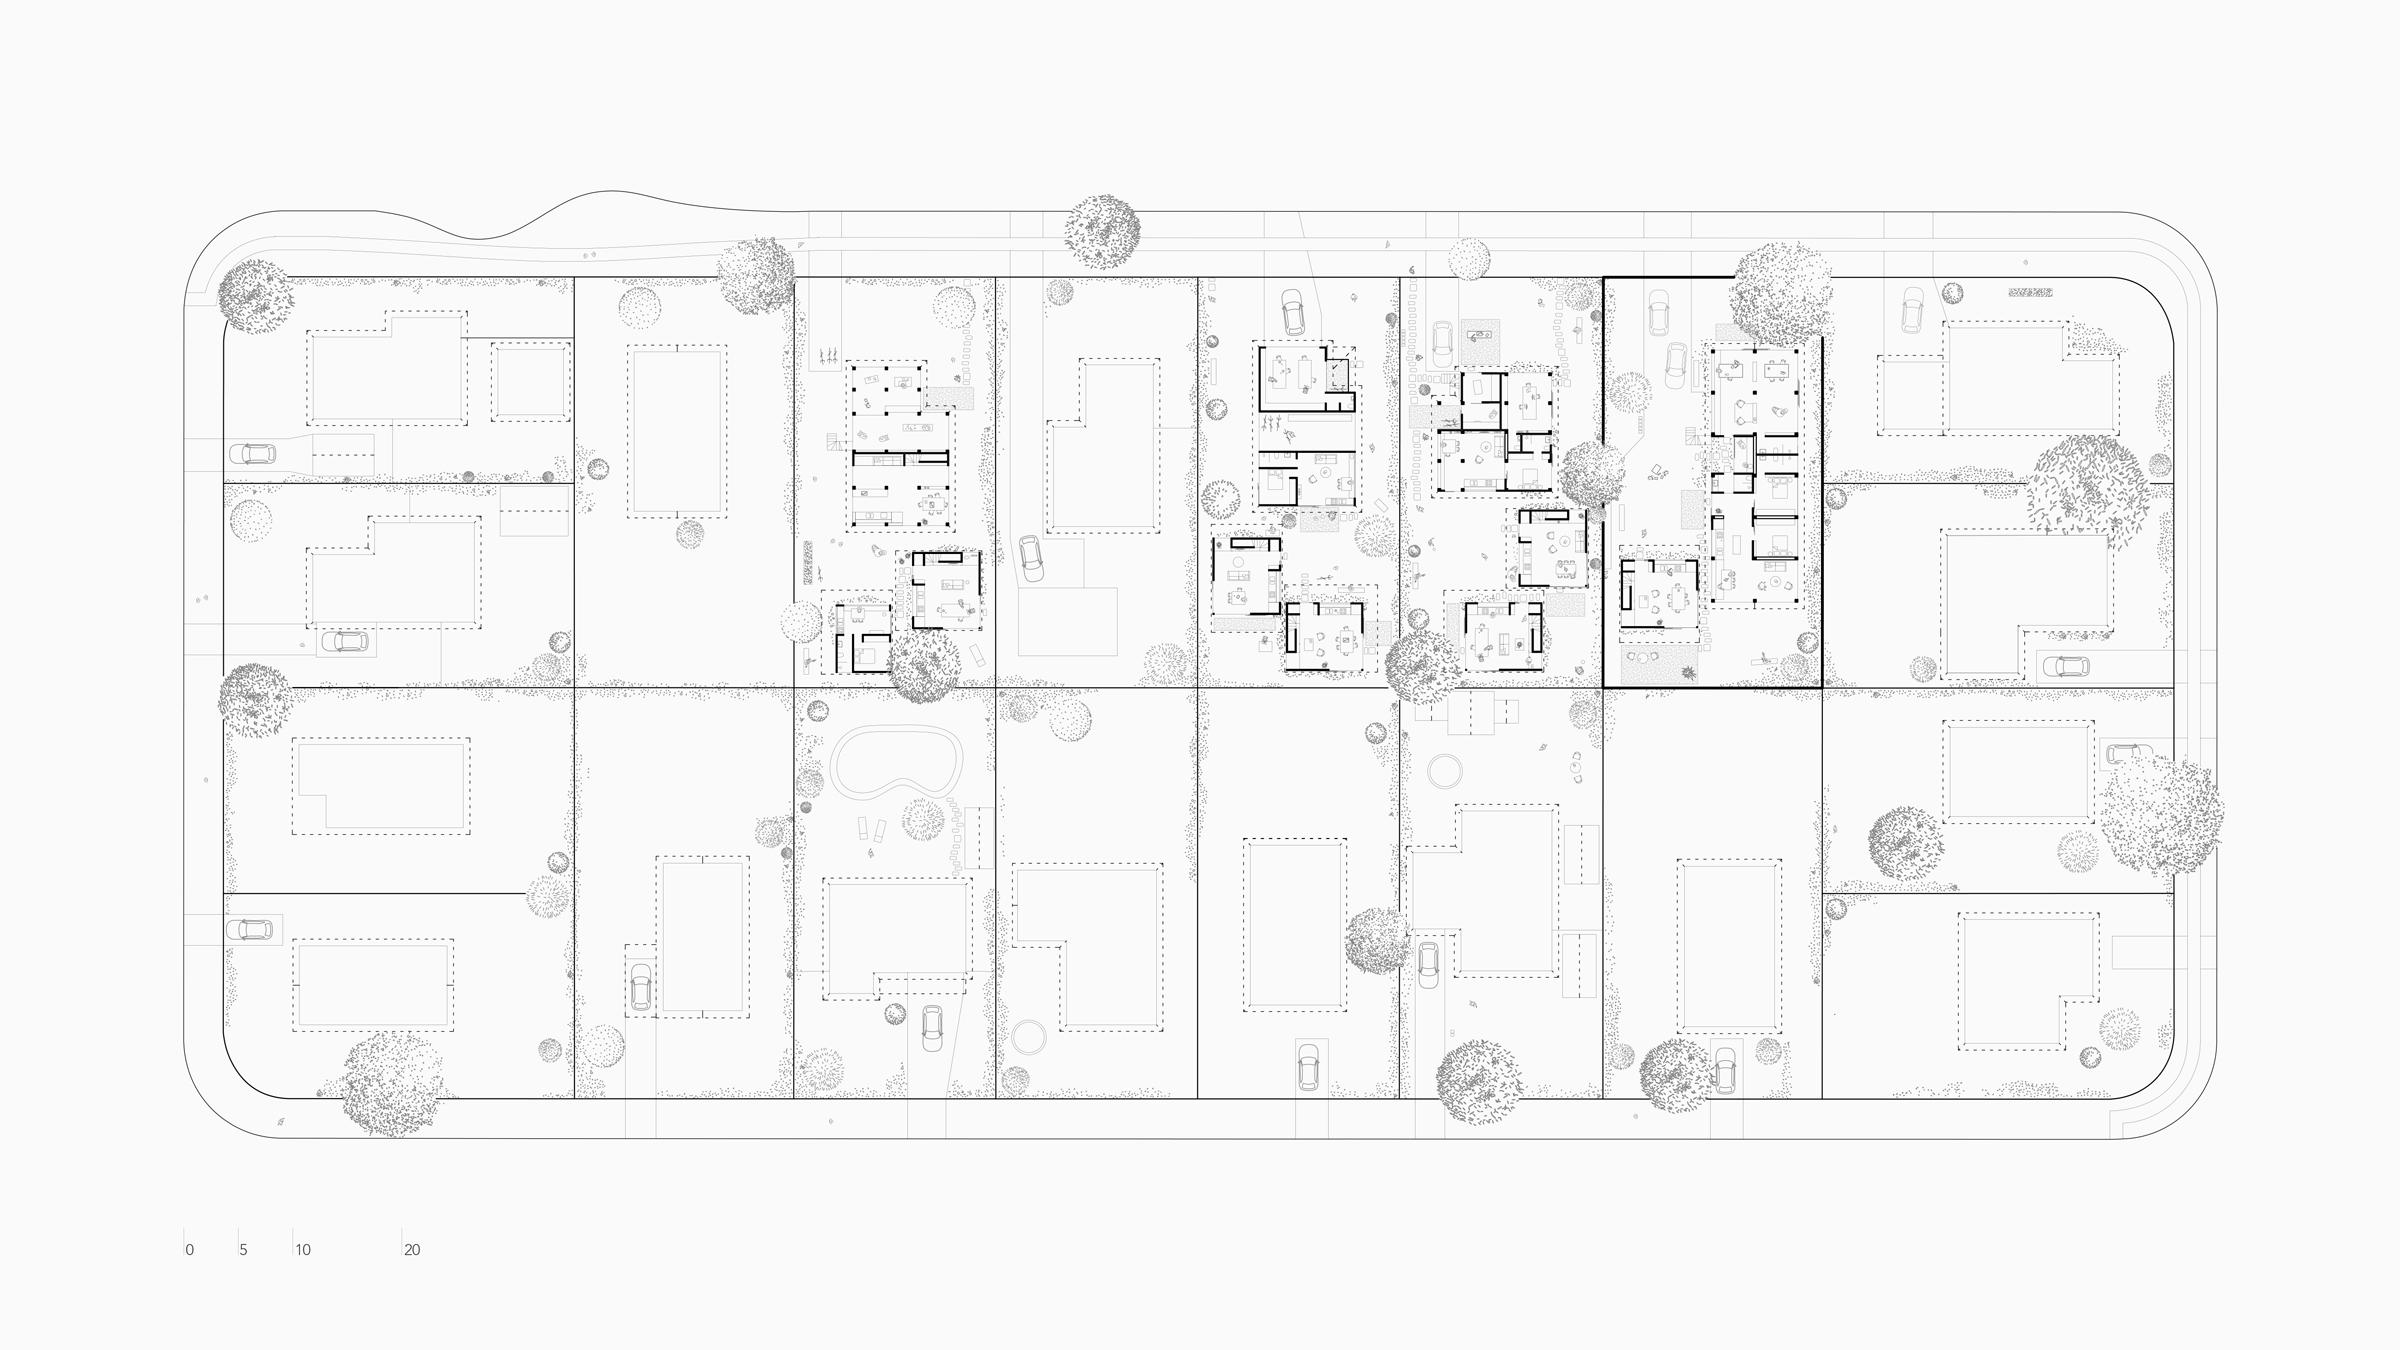 171212-Dappled-Dwellings-Site-Plan-Stage-03.jpg